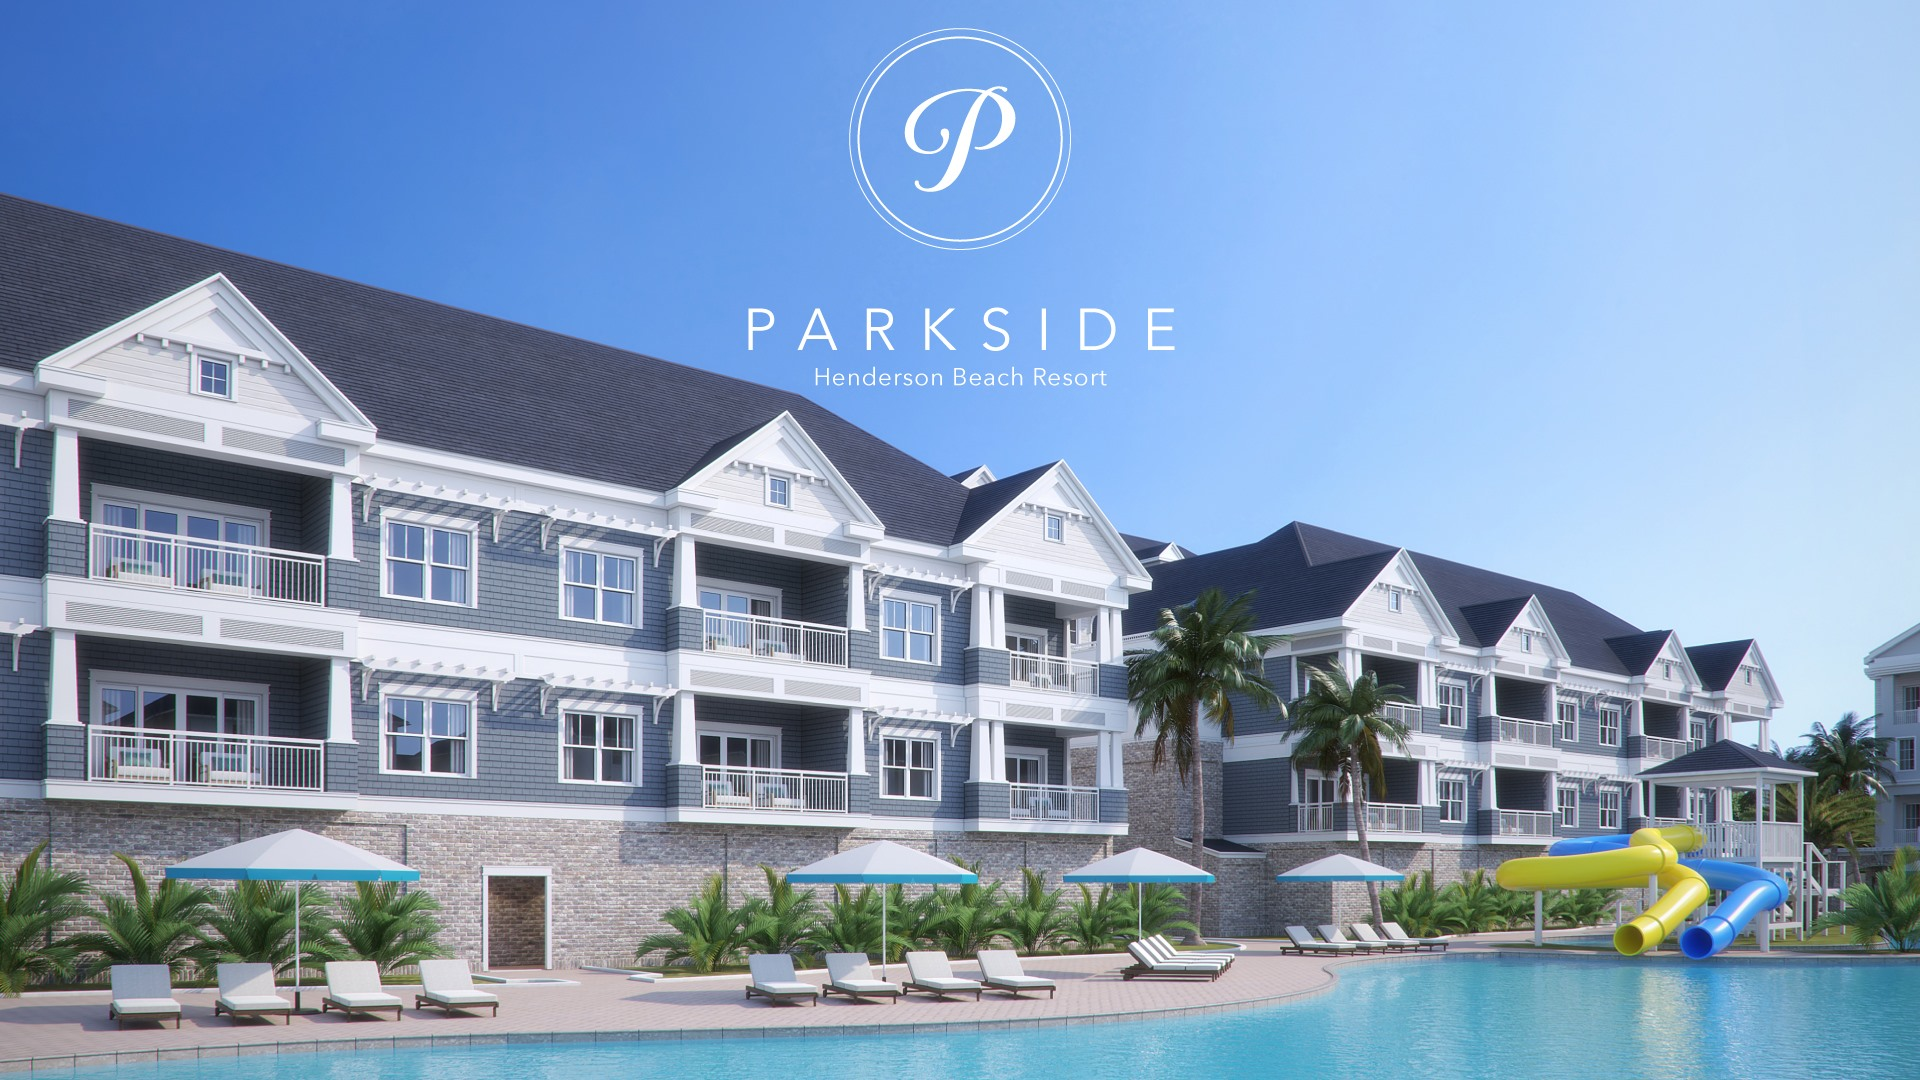 PARKSIDE-HENDERSON-BEACH-RESORT-PRESCOTT-ARCHITECTS-DESTIN-FLORIDA-EFFORTLESS-RESORT-LIVING-JEFFREY-PRESCOTT-COMMERCIAL-ARCHITECTURE-2.jpg